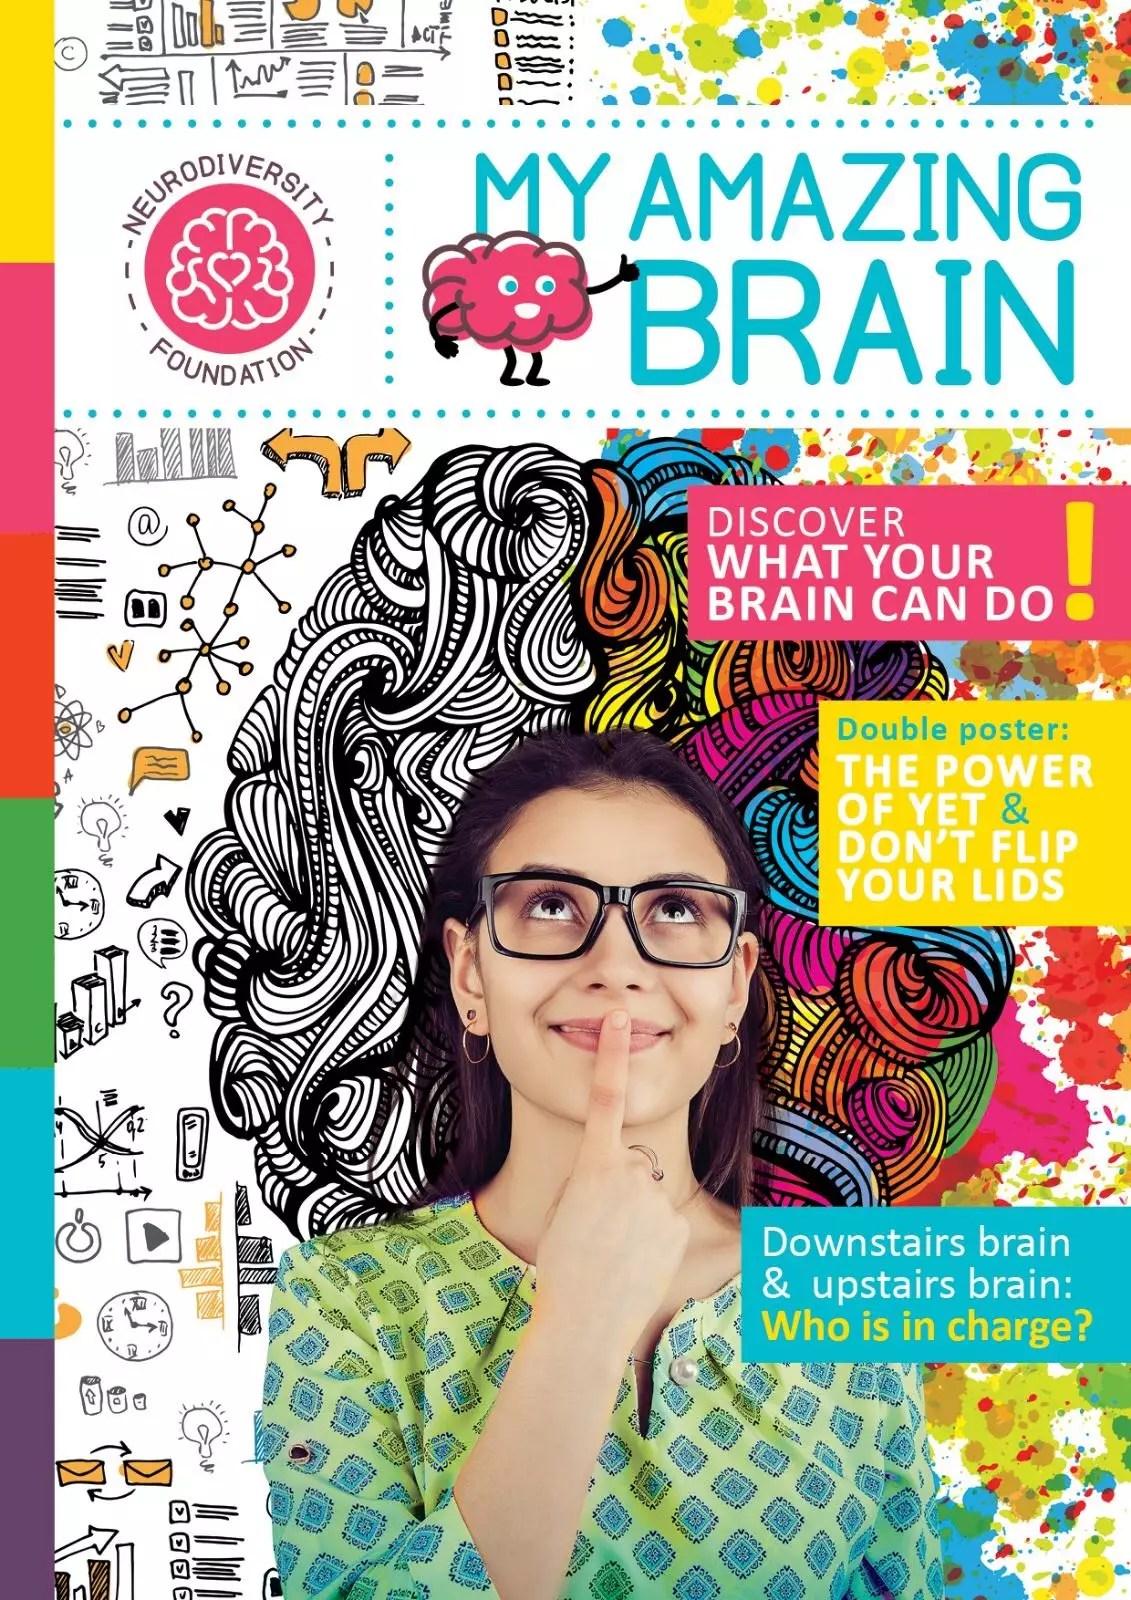 My Amazing Brain Magazine, made by Lana, Eleonora and Saskia